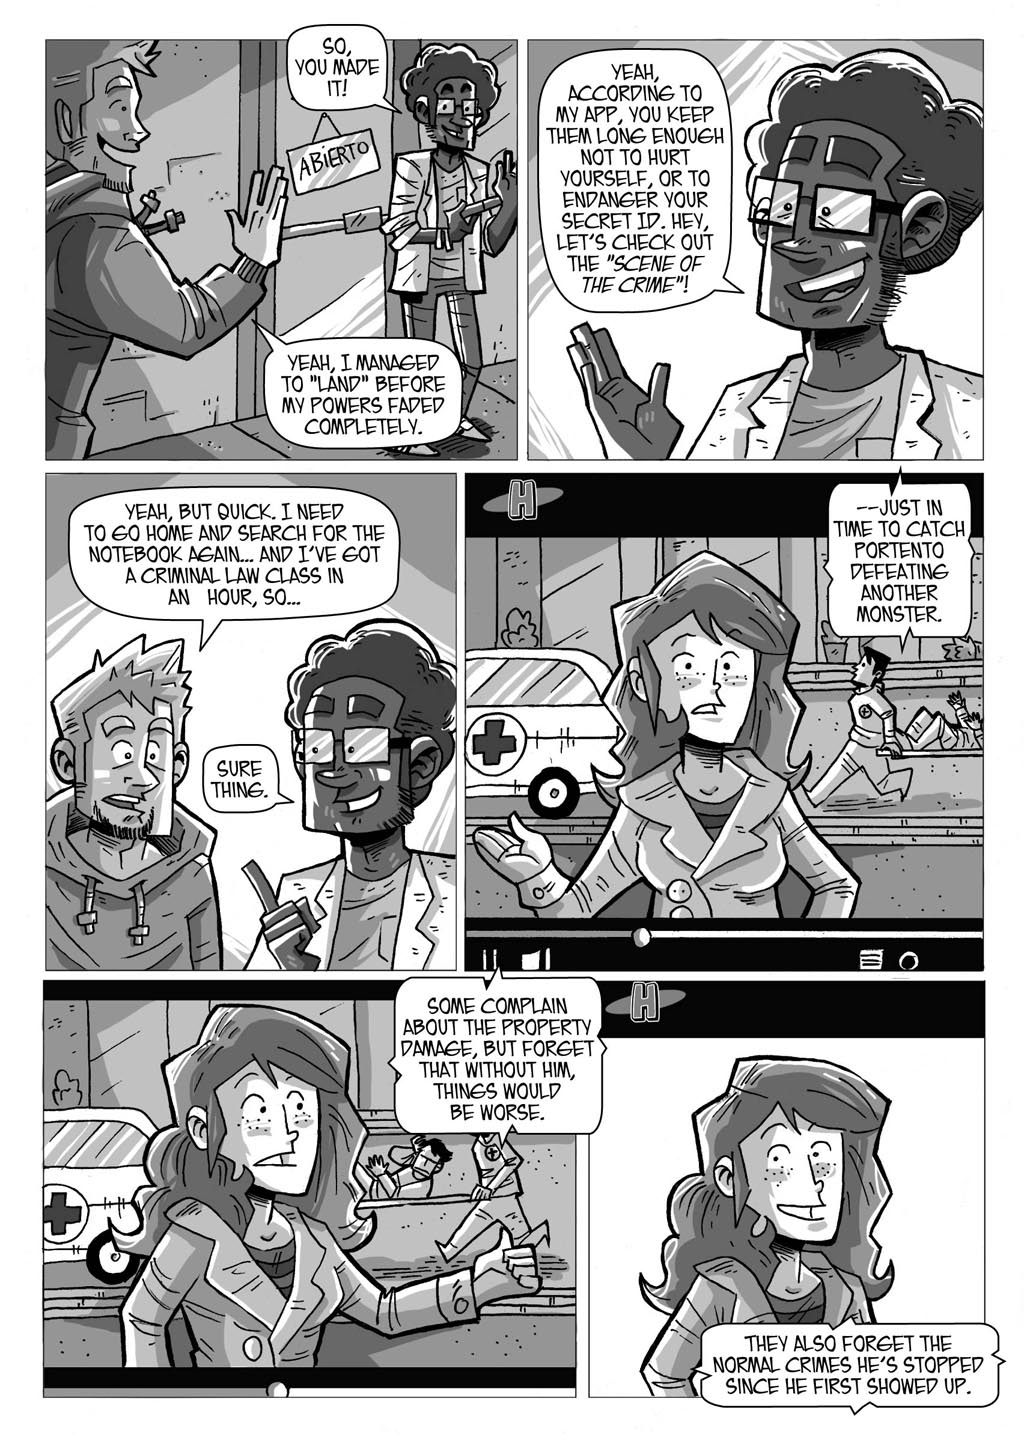 Portent - Page 7